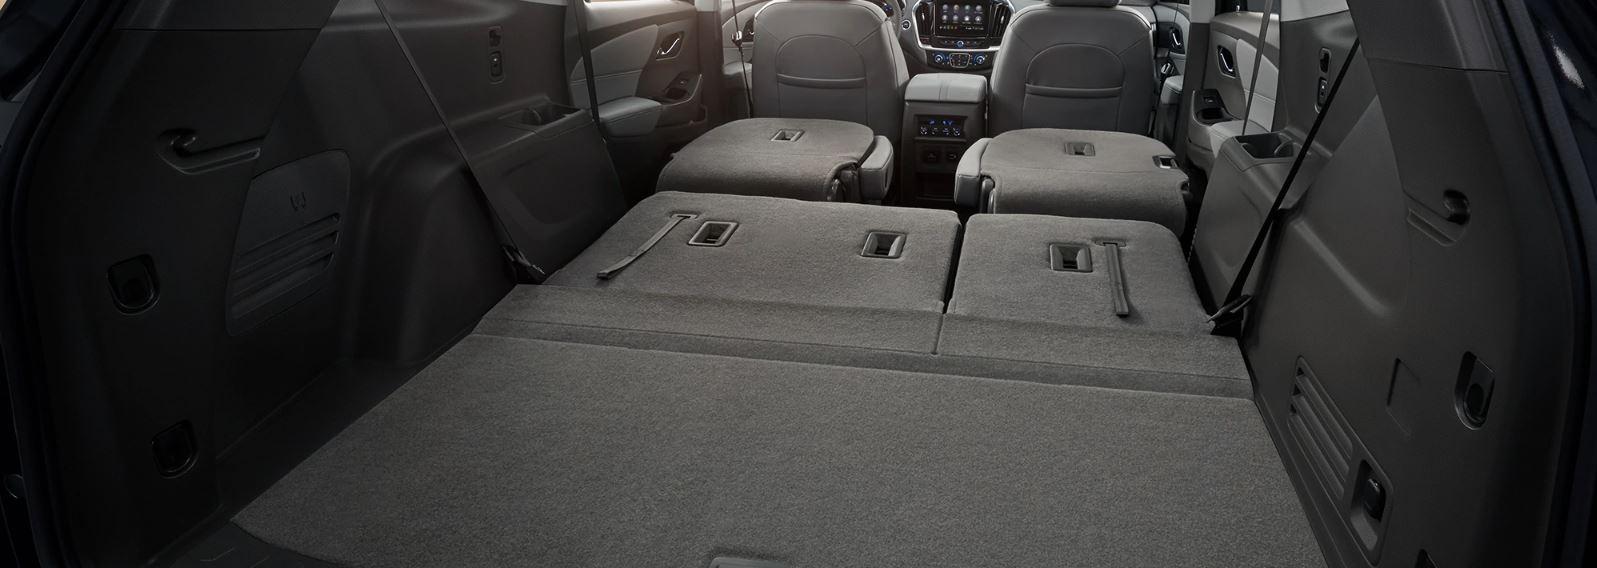 2020 Chevrolet Traverse Cavernous Interior